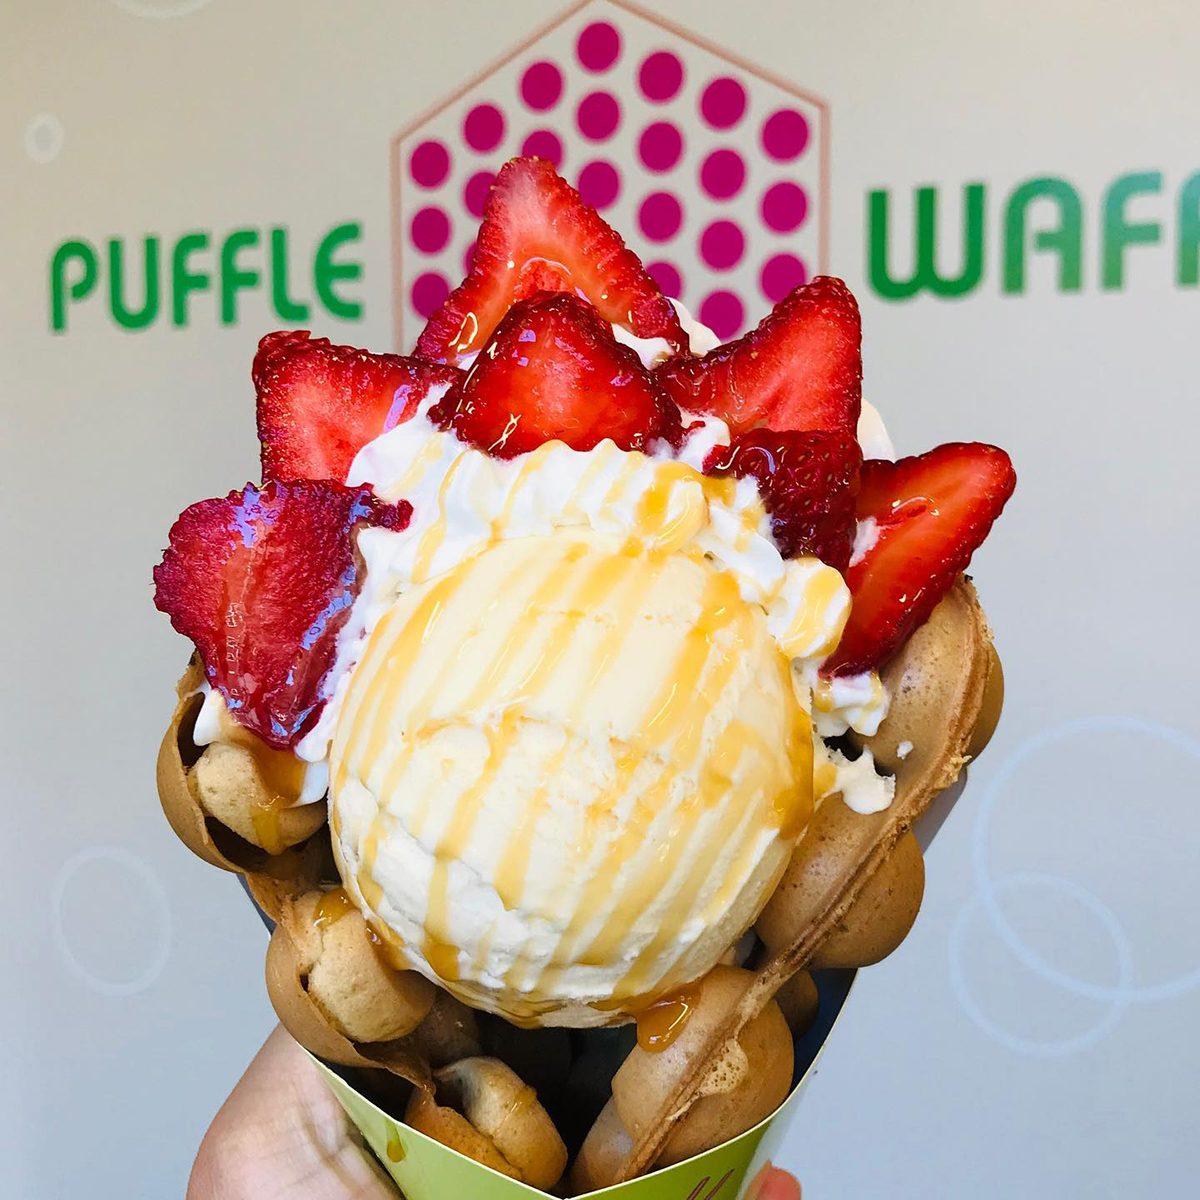 Puffle Waffle PDX restaurant